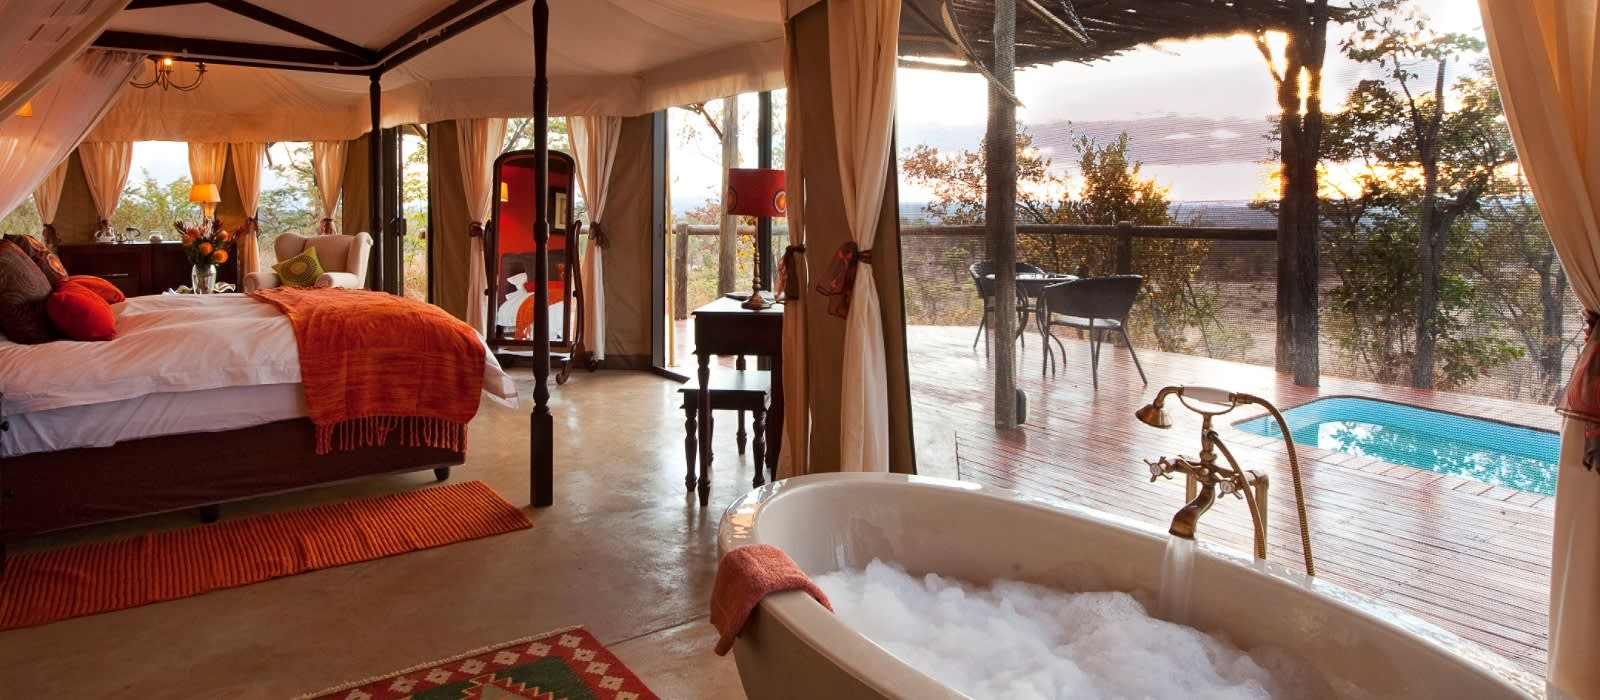 Room at Elephant Camp in Victoria Falls, Zimbabwe